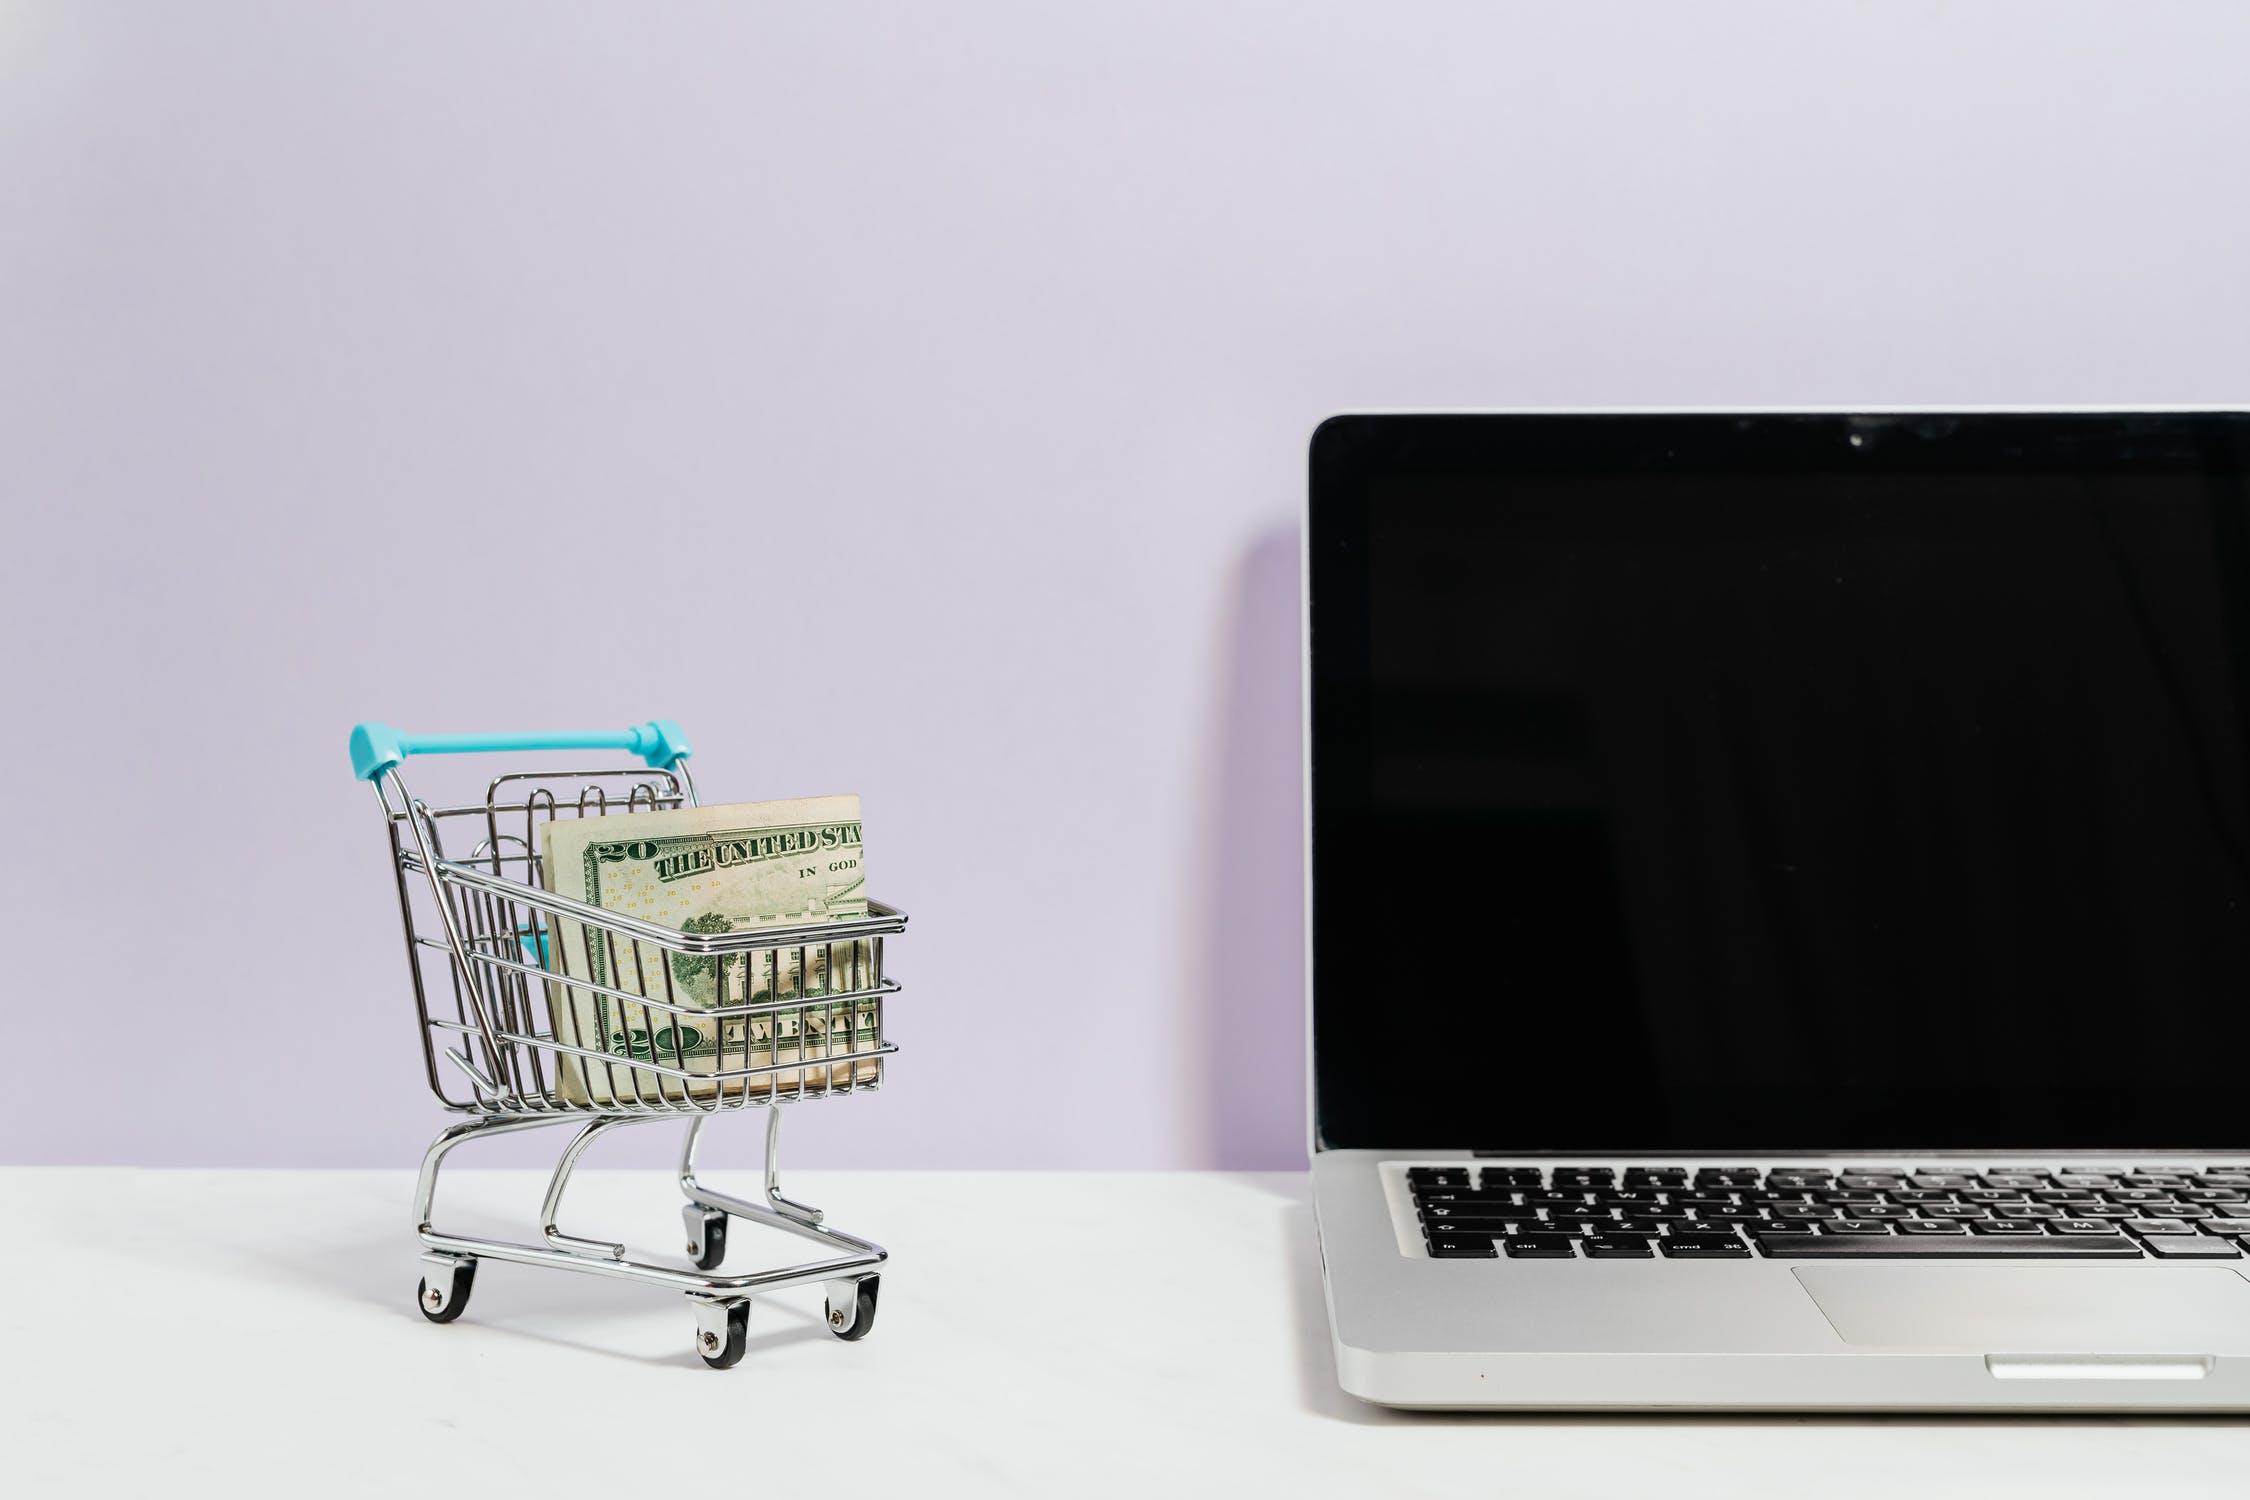 Retail Media Networks - Instacart, Ulta Beauty & Gopuff